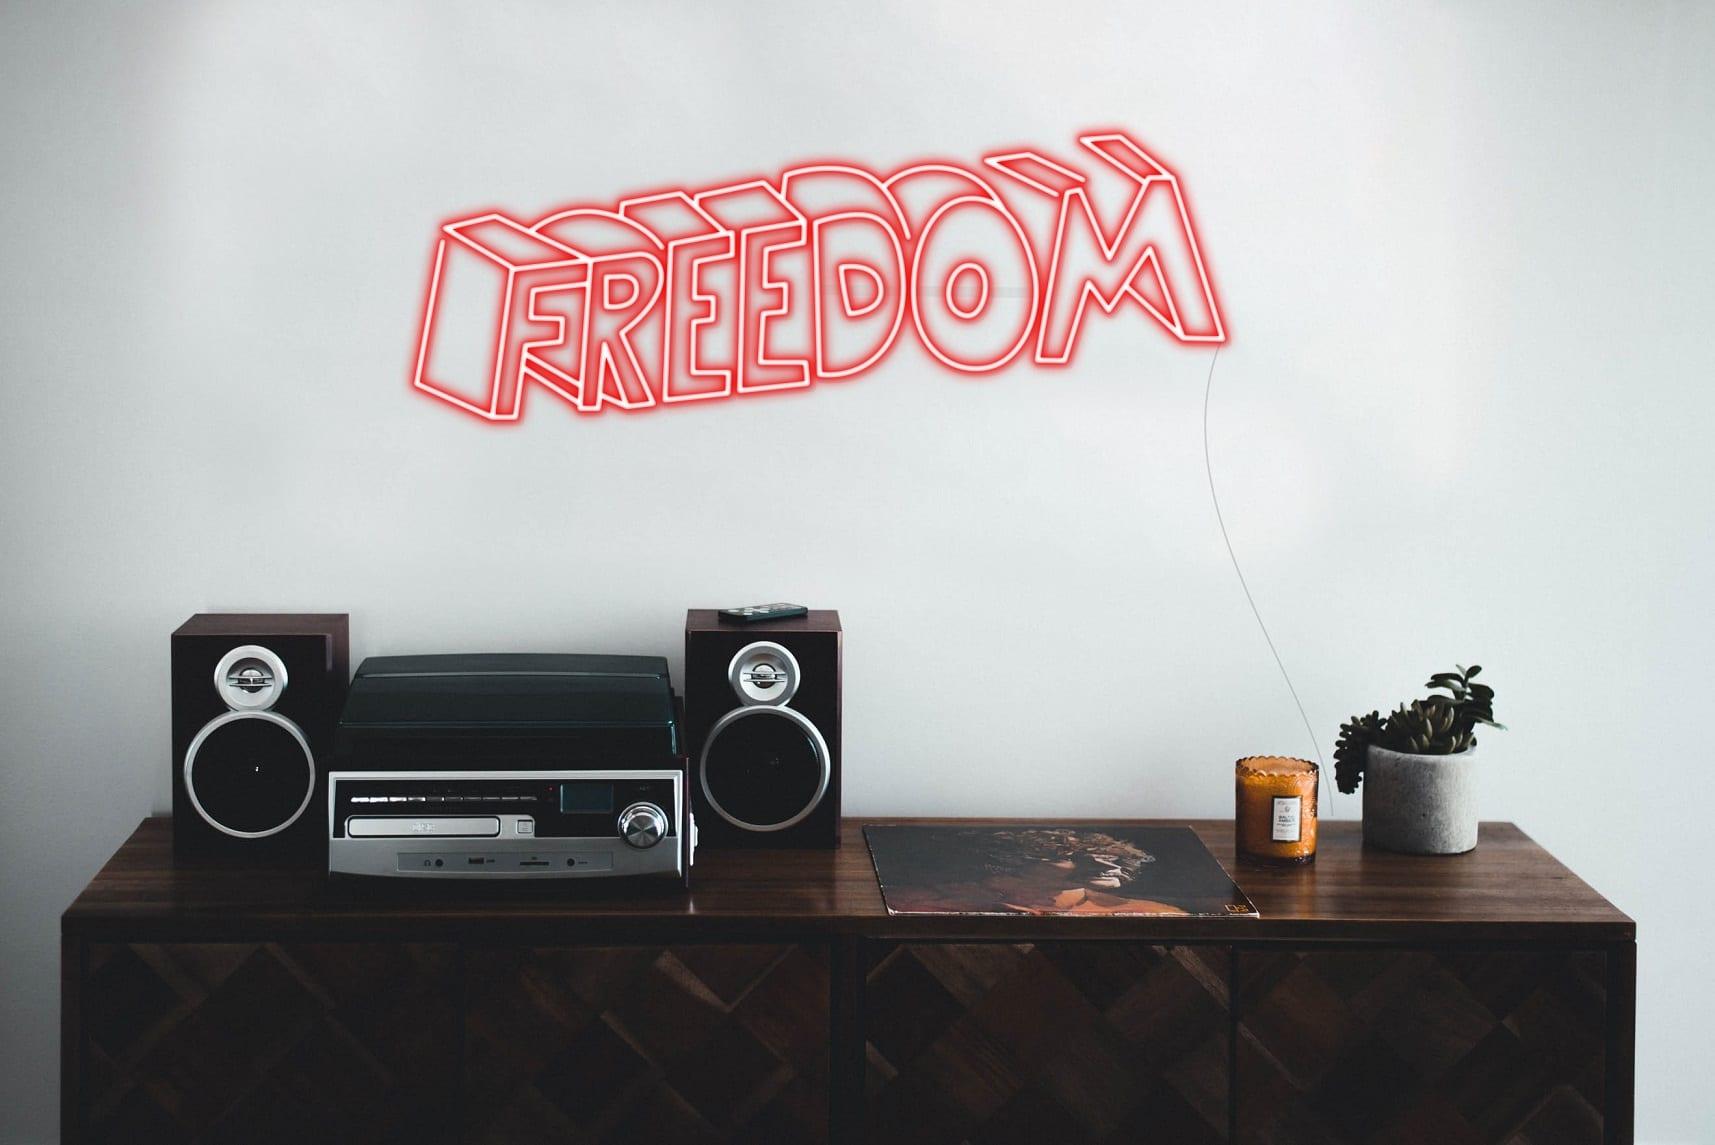 freedom neon sign